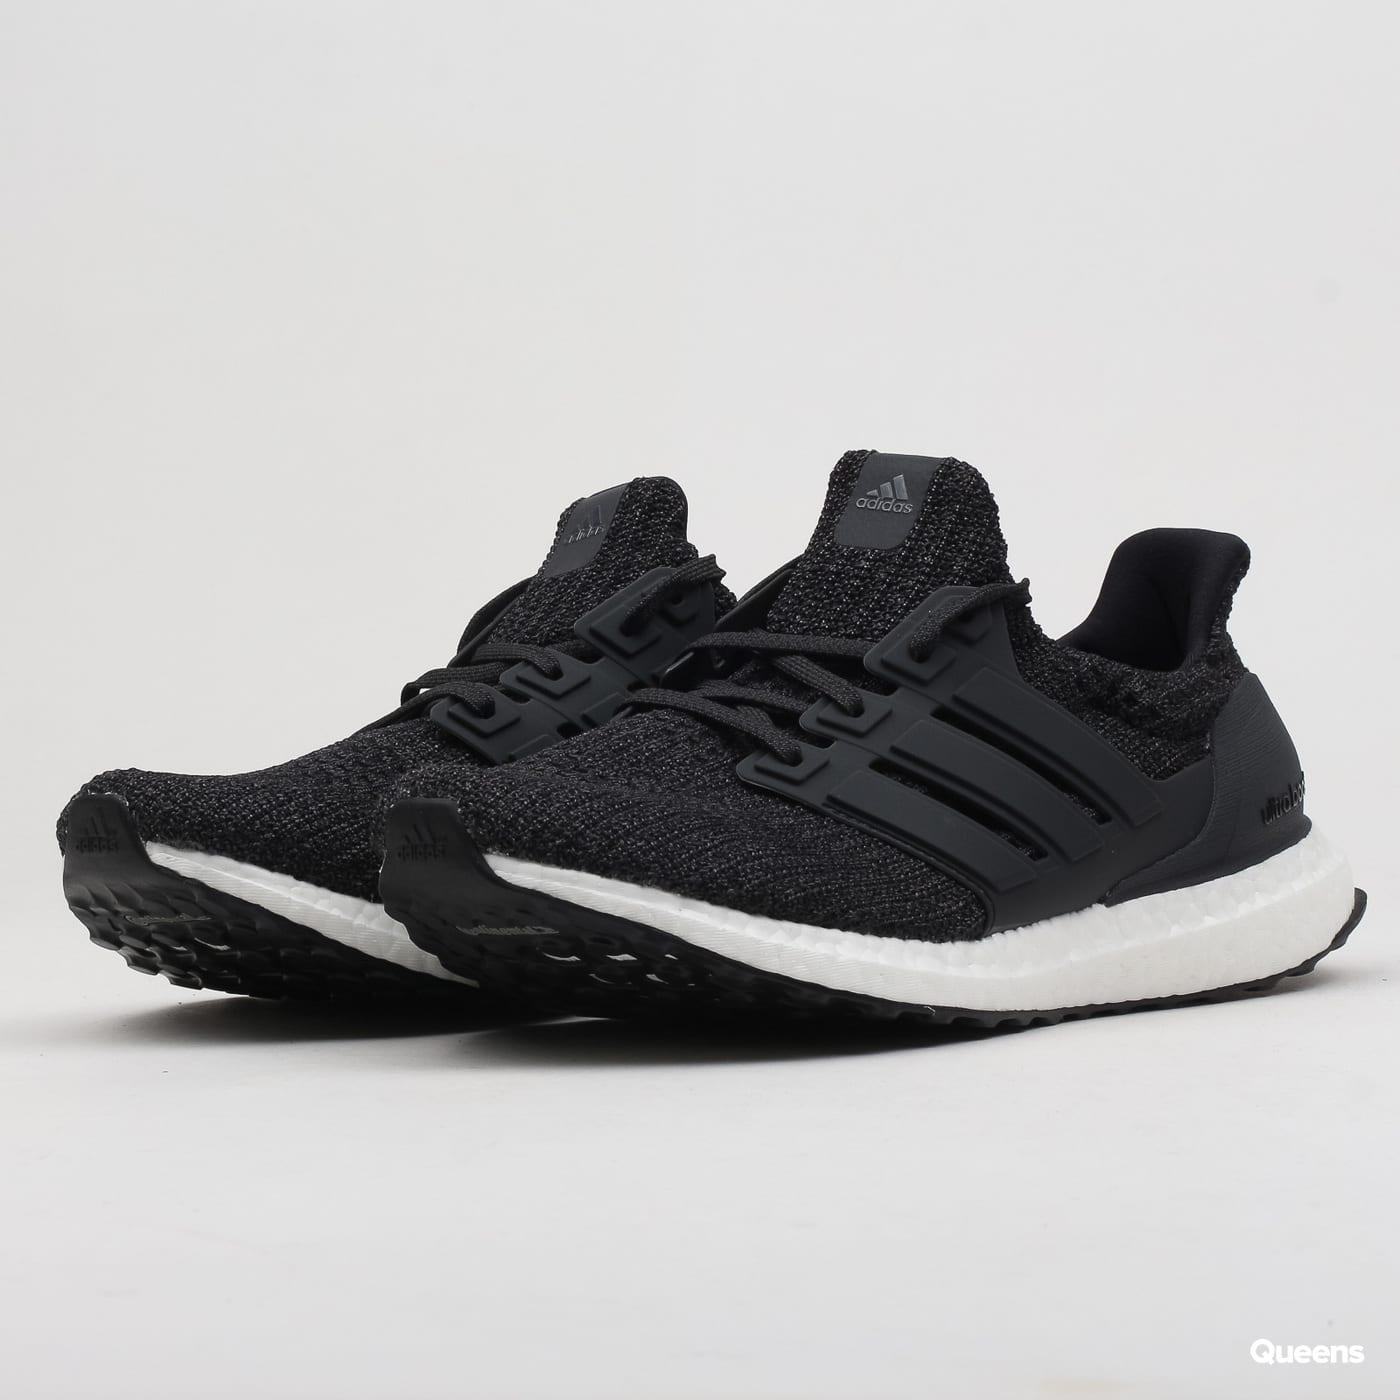 9cecc0affad Sneakers adidas Performance UltraBoost (CM8116)– Queens 💚